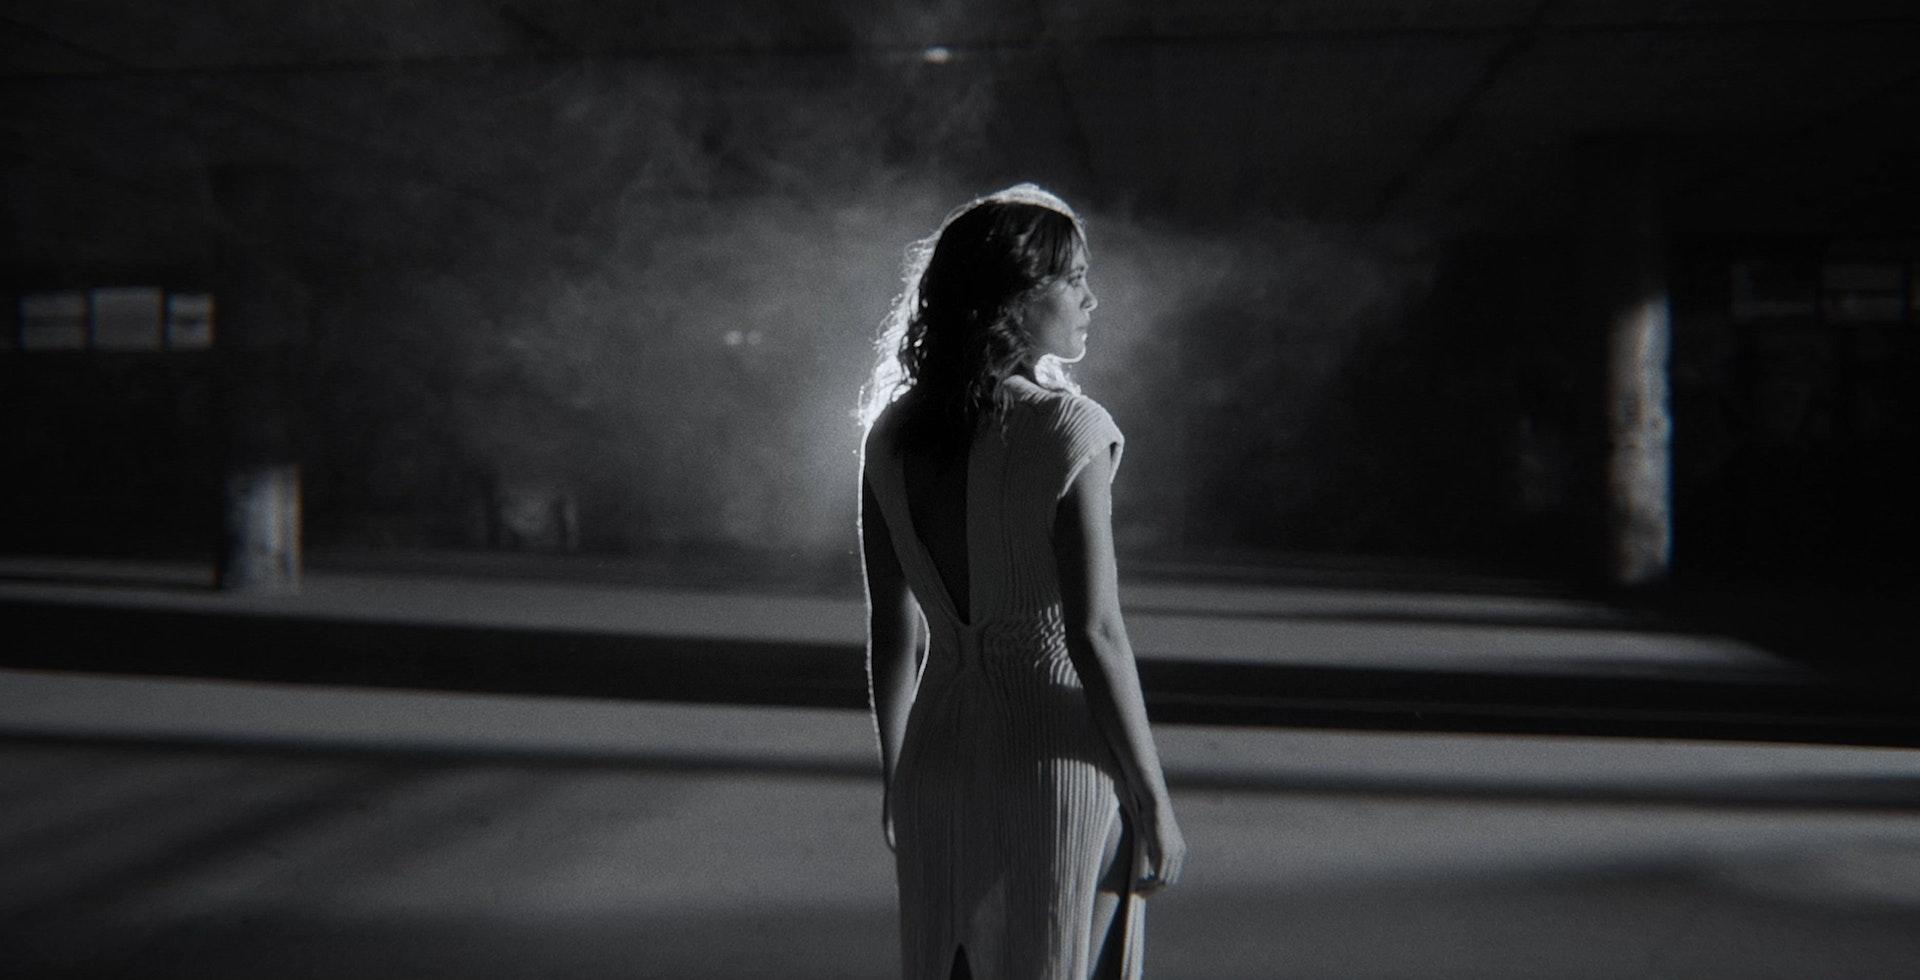 Moullinex - Running in the dark